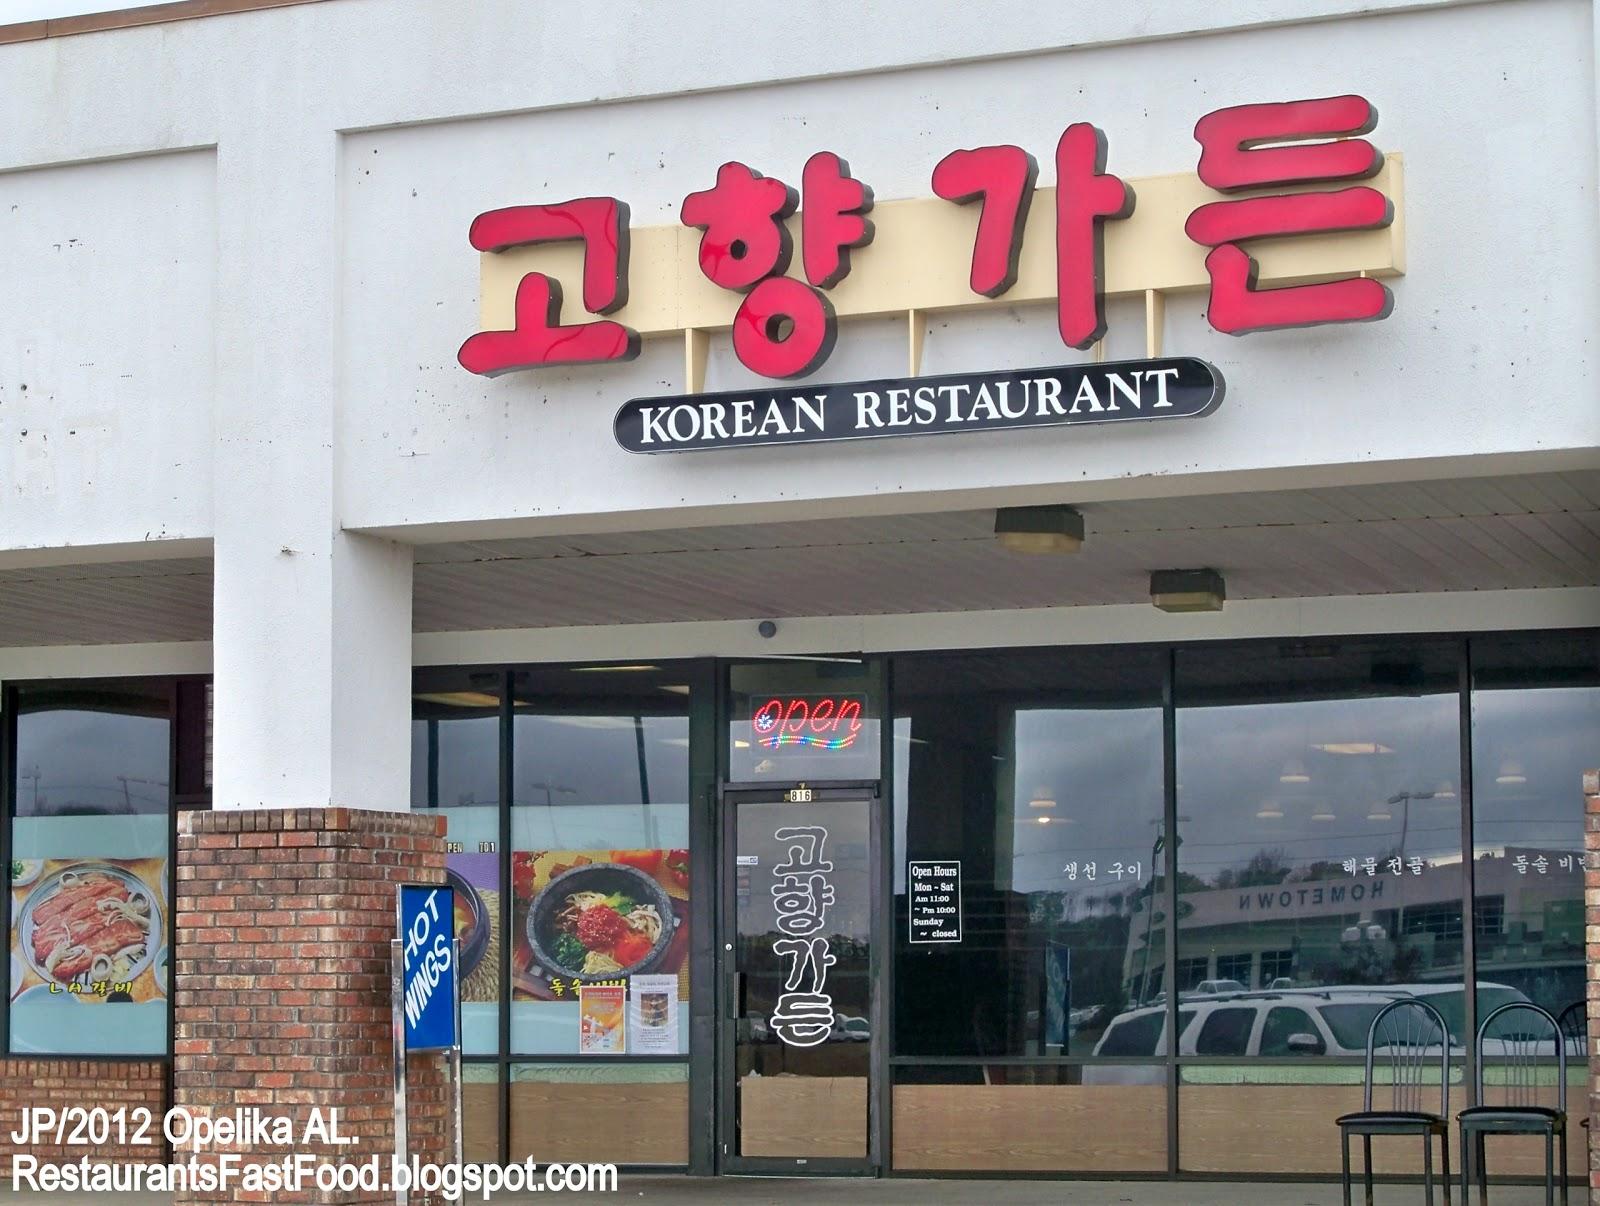 Alabama lee county salem - Korean Restaurant Opelika Alabama Columbus Parkway Gohyang Garden Korean Restaurant Lee County Opelika Auburn Al